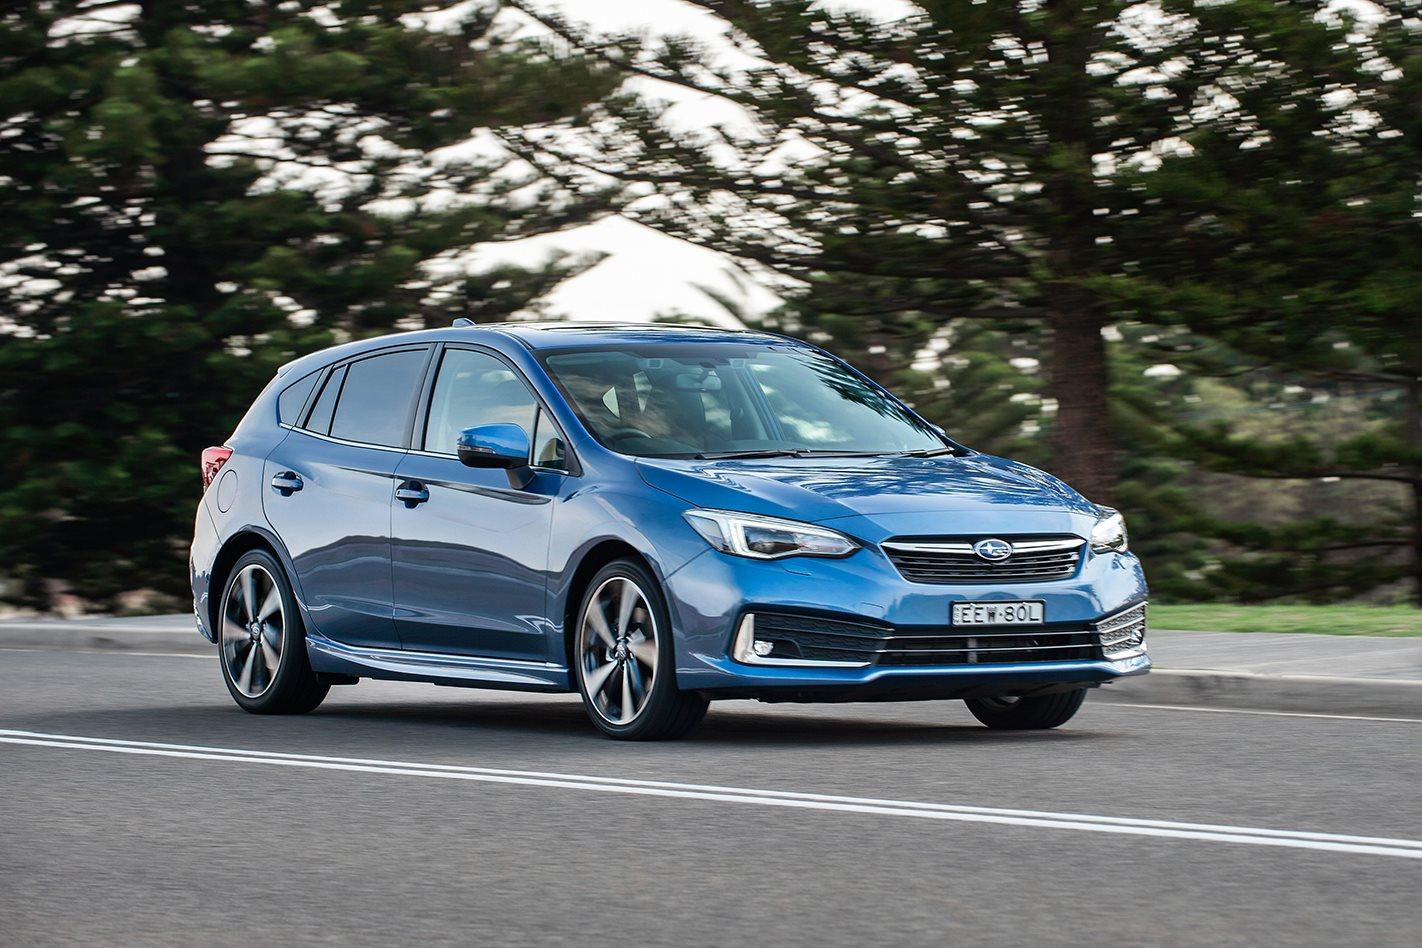 Subaru Impreza 2020 Review Price Specs Features